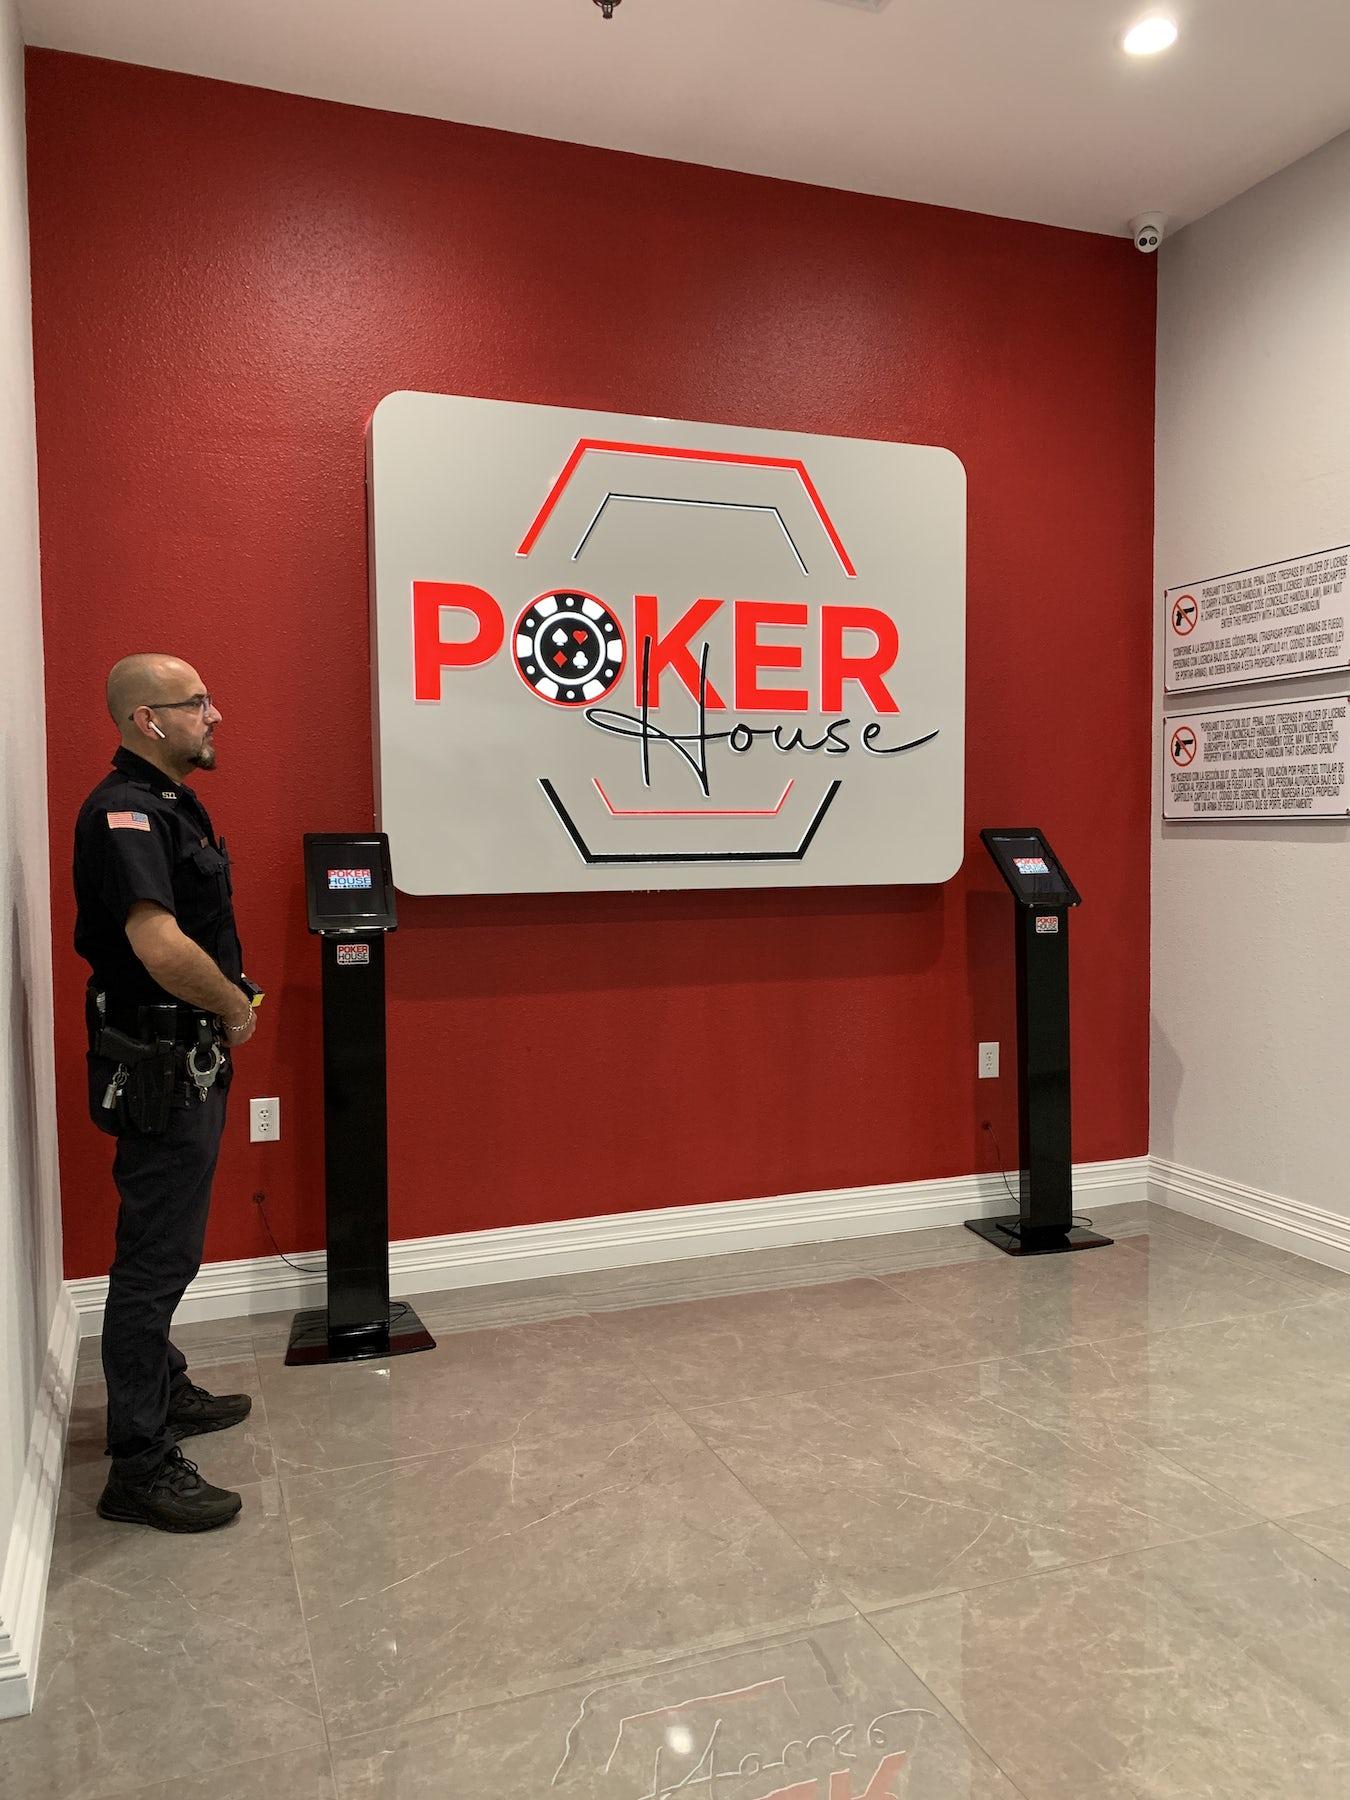 Poker House of Dallas in Beyond Dallas